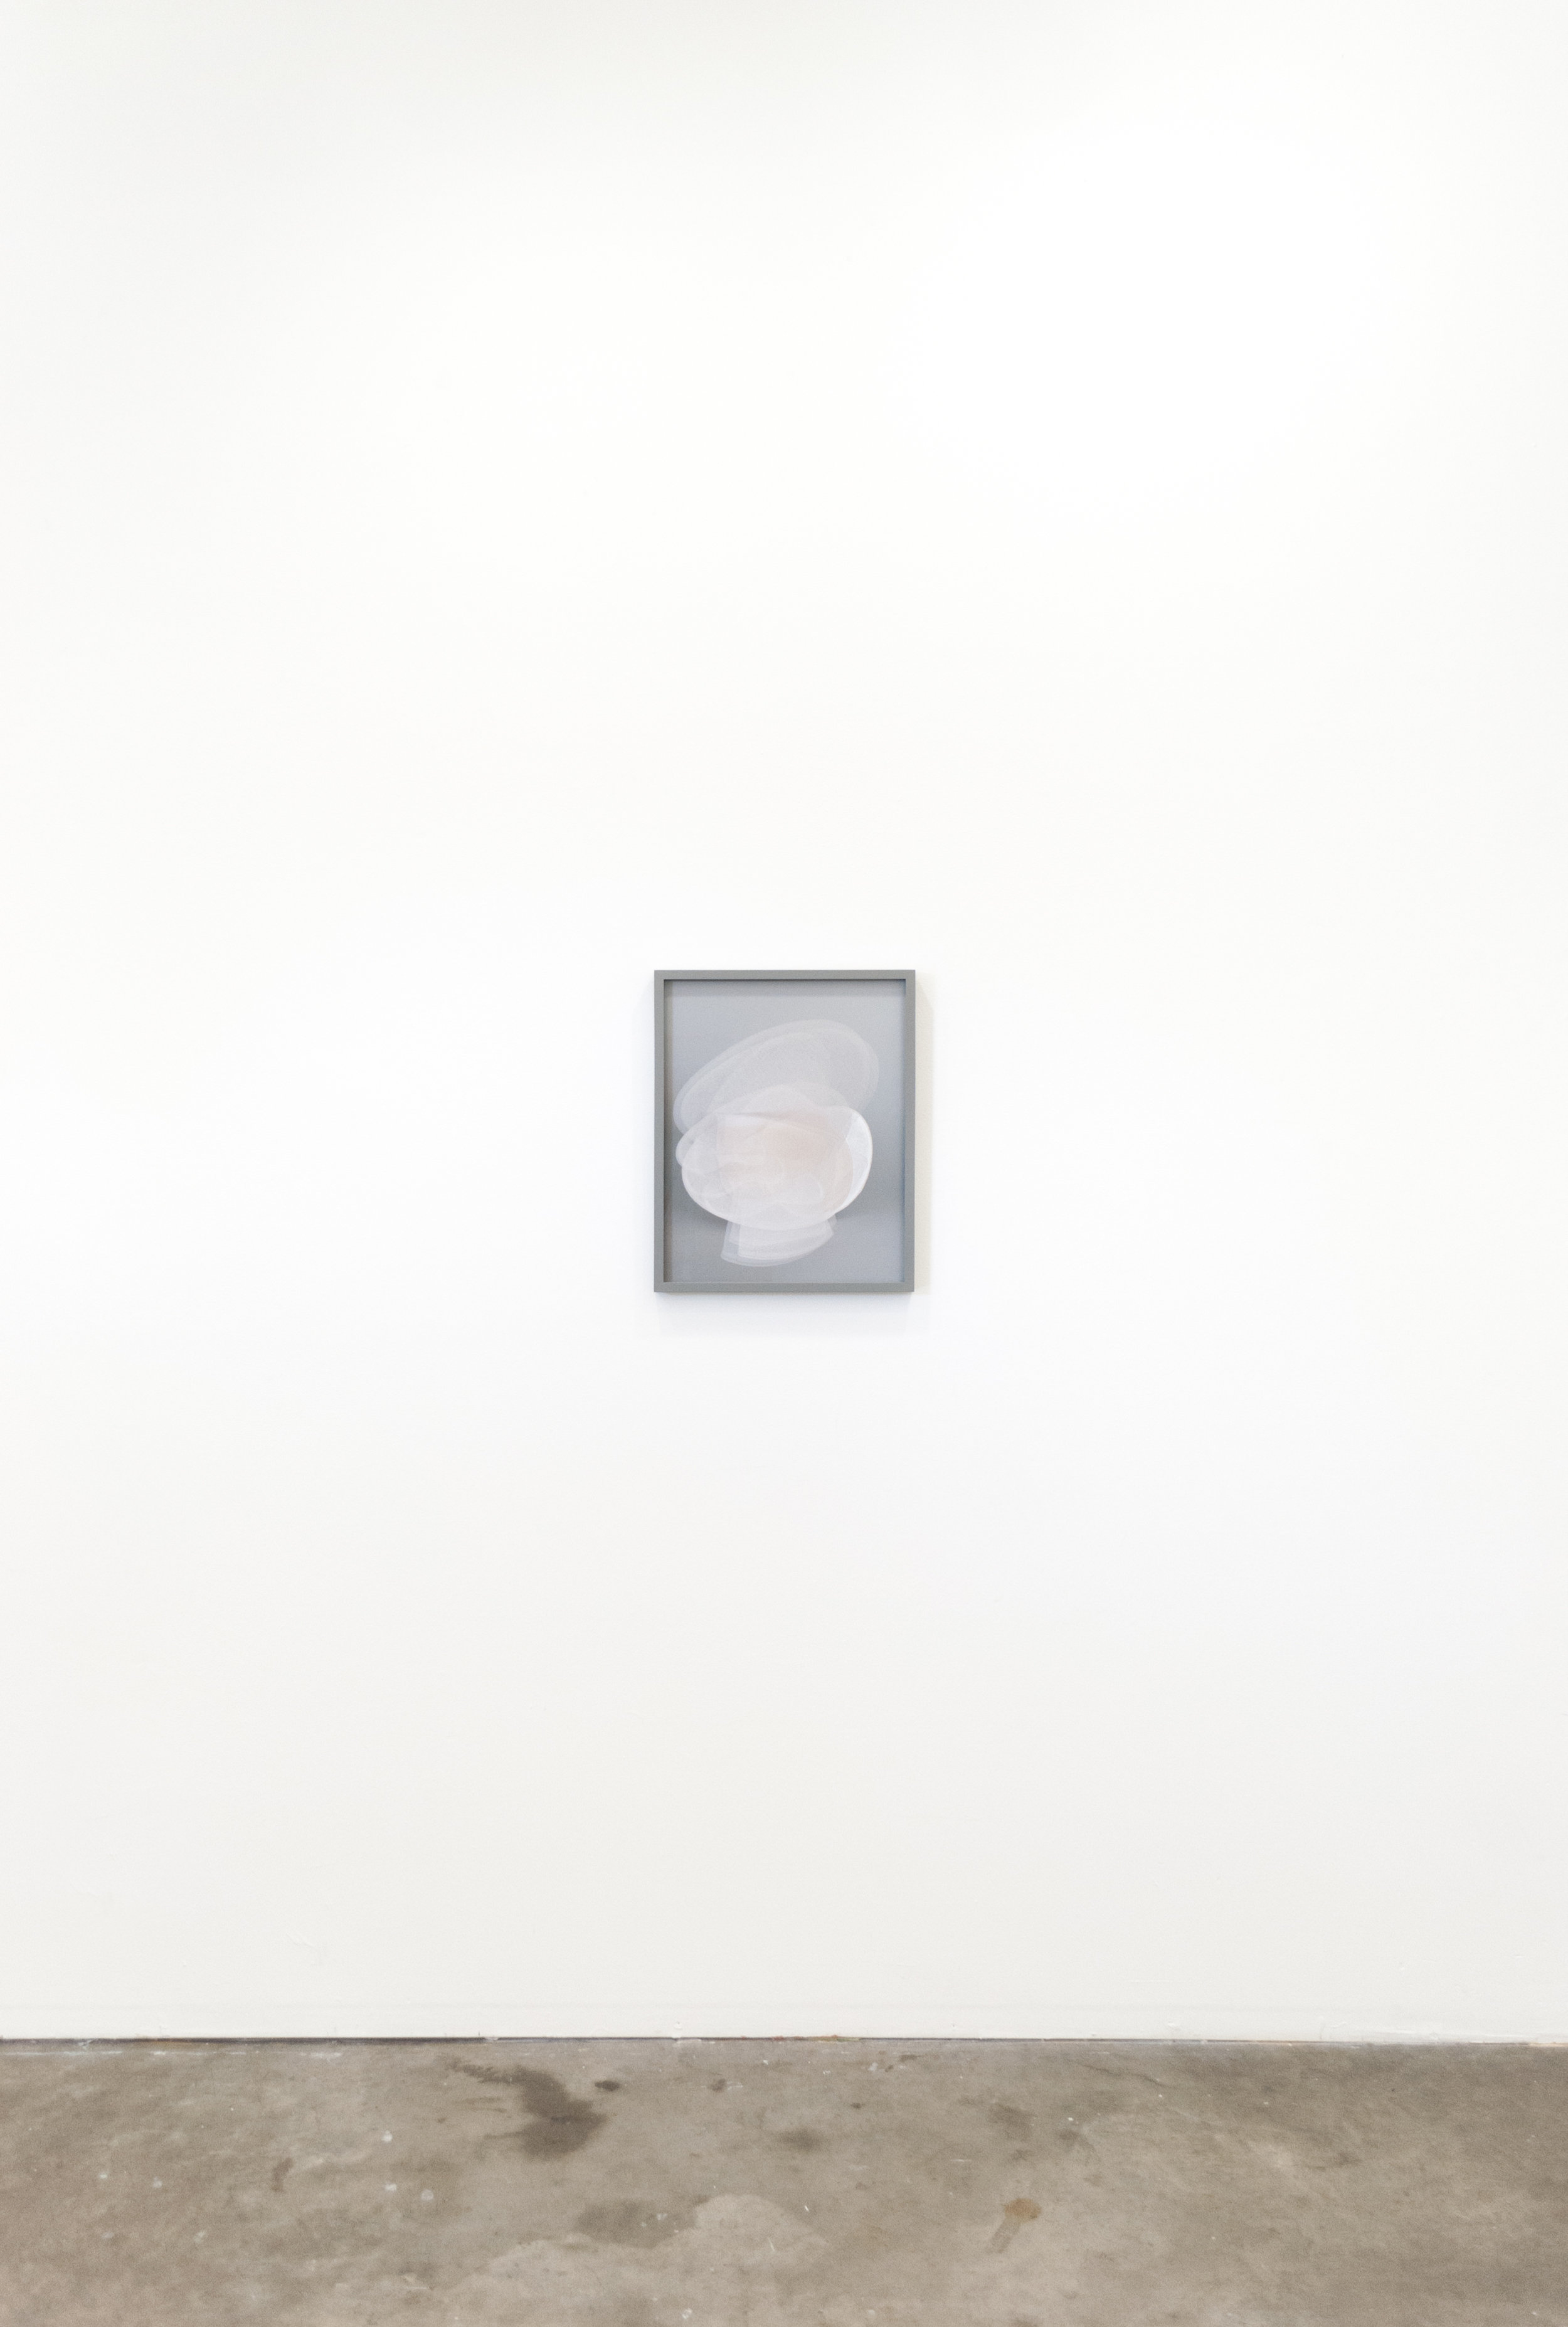 Melanie_Flood-Latent_Desire-Install-11.jpg